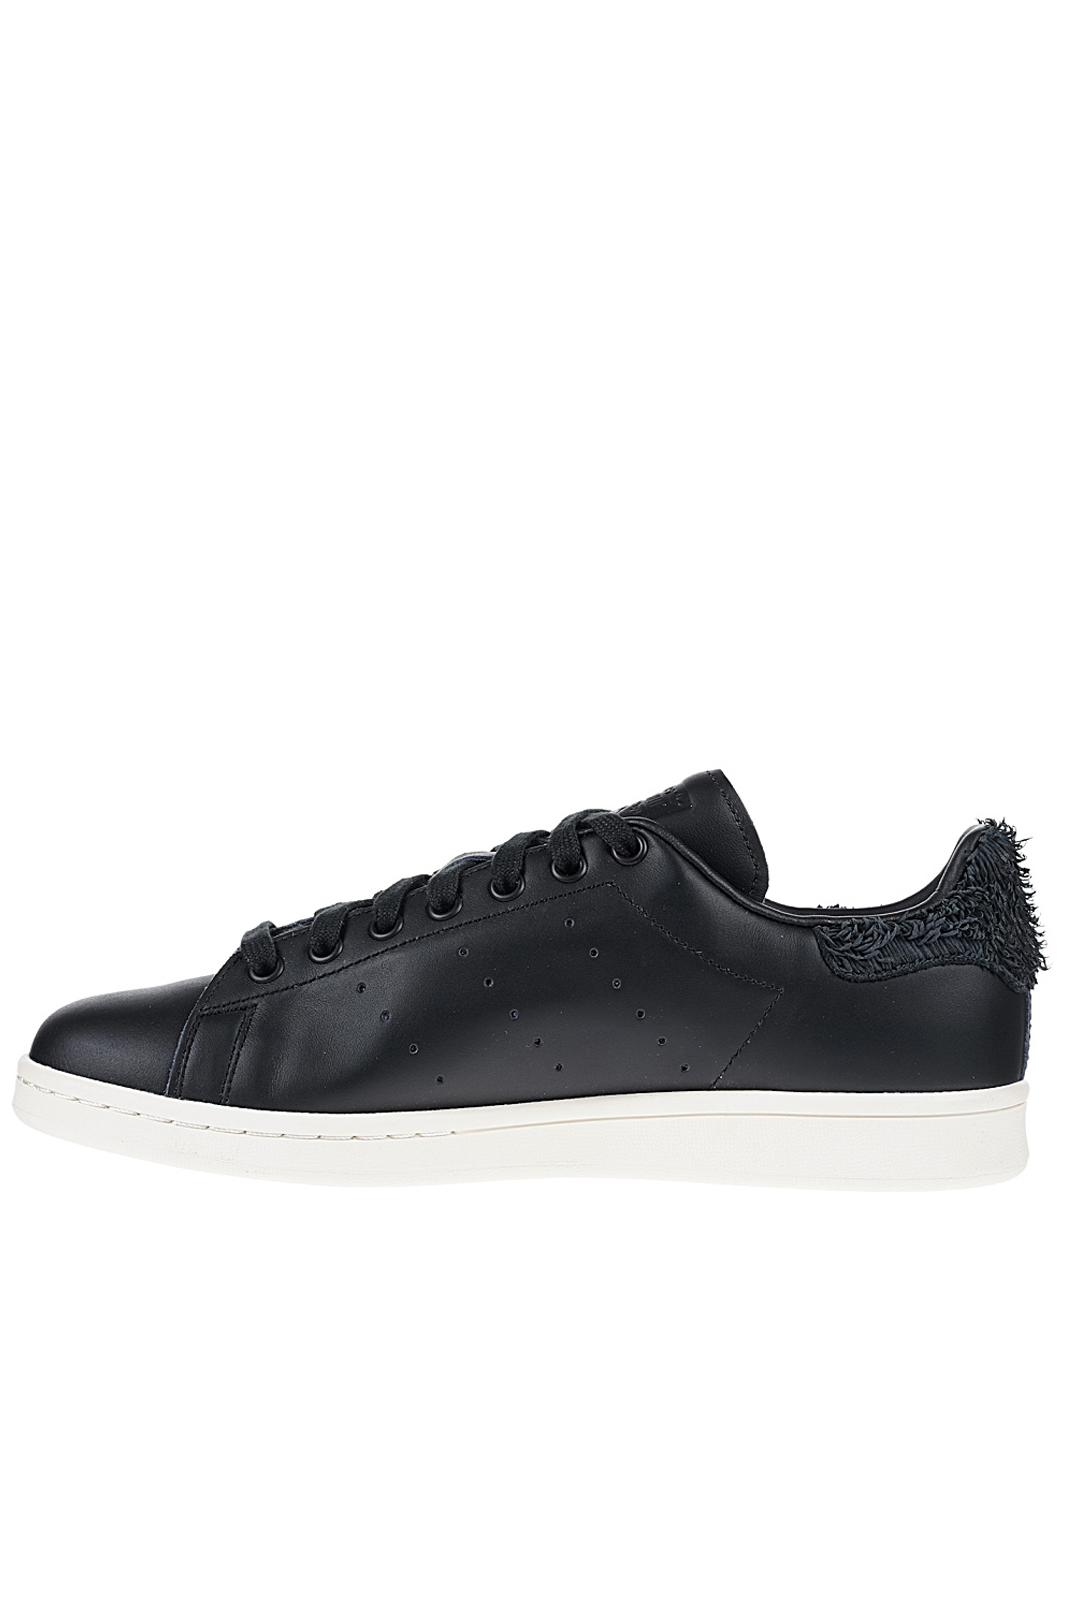 Baskets / Sneakers  Adidas BA7779 STAN SMITH CNY NOIR